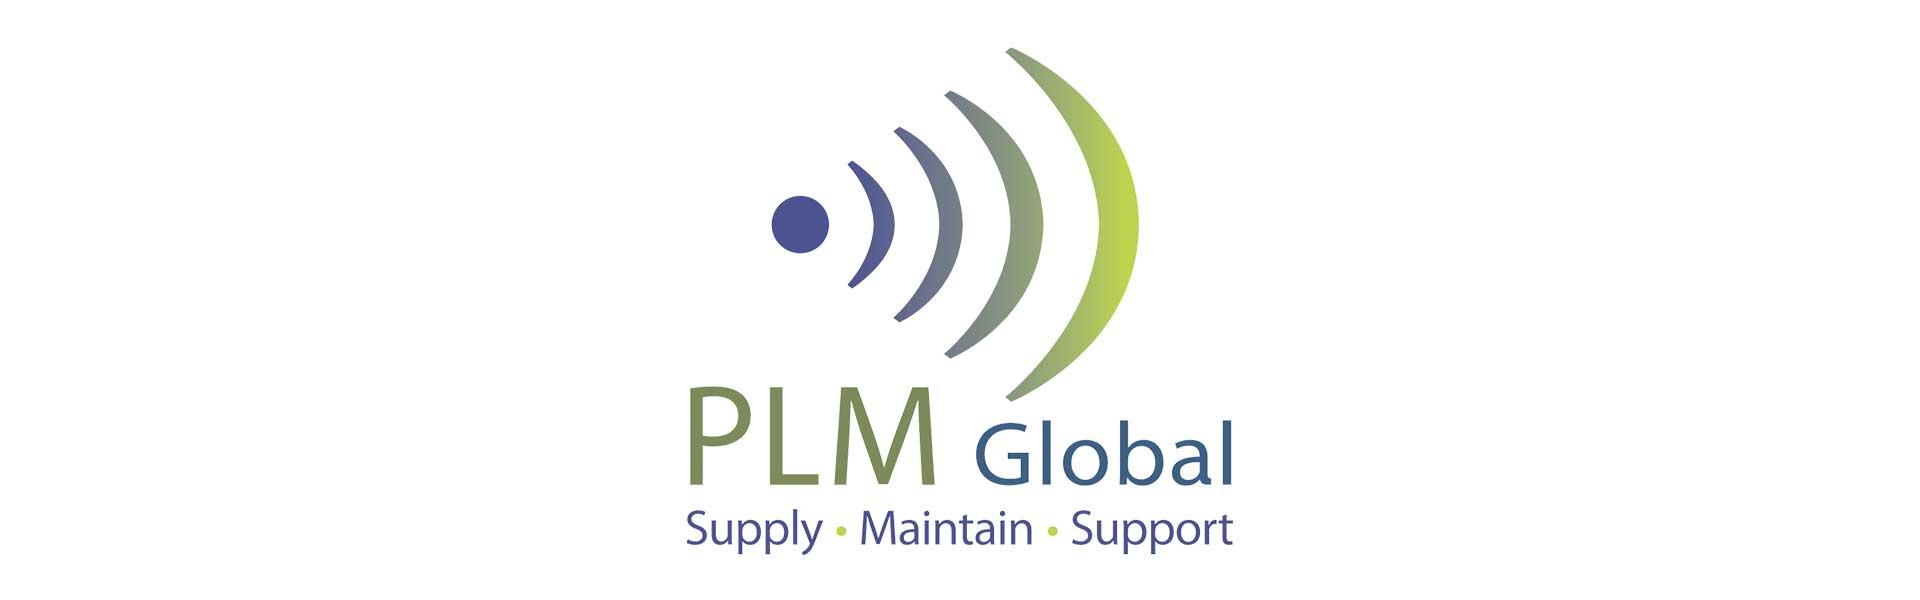 PLM-Global